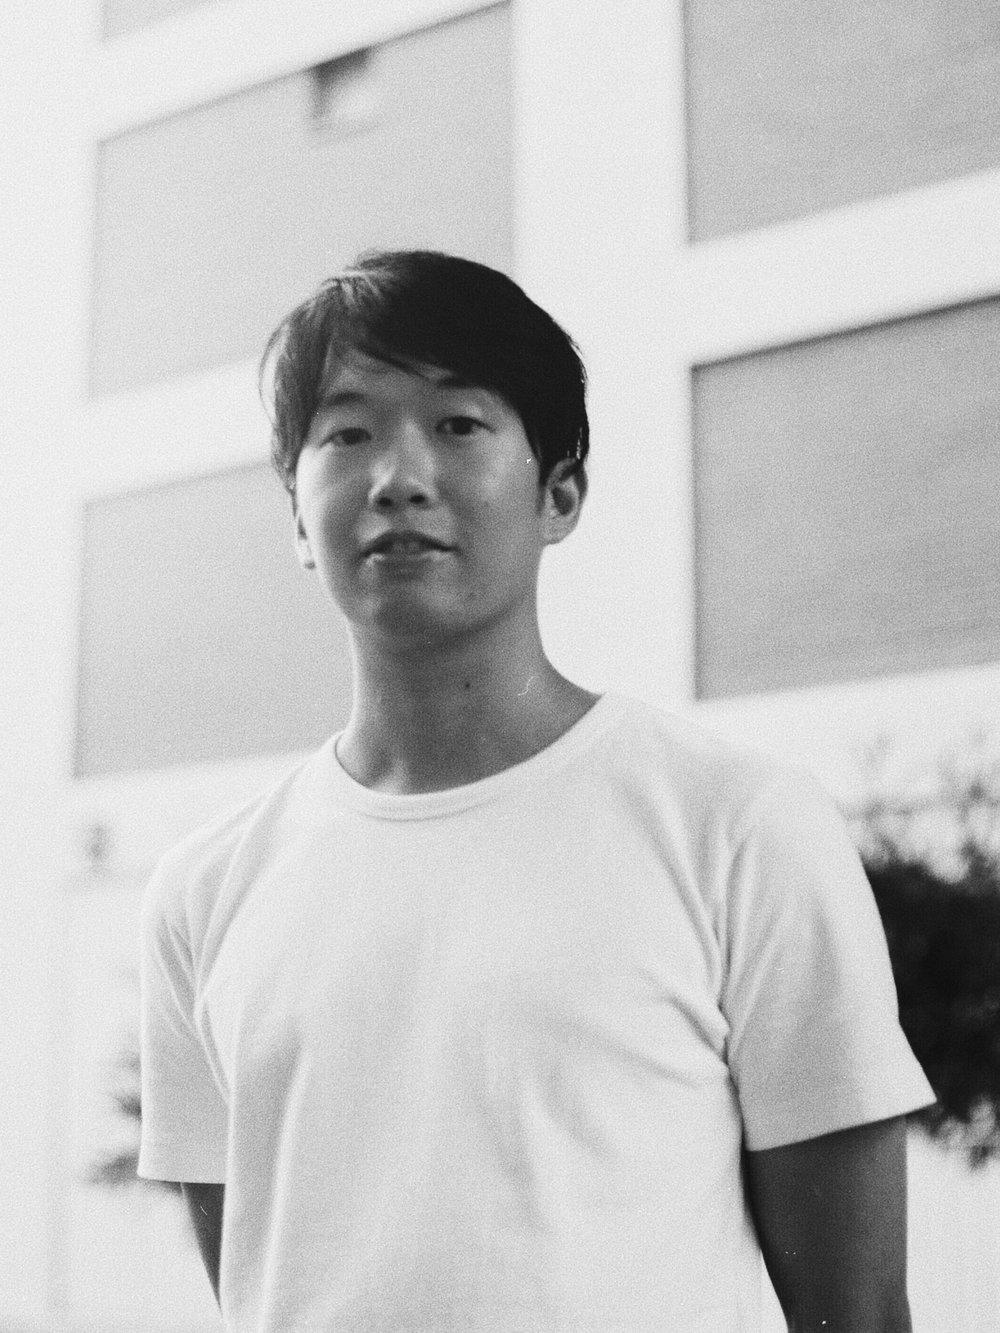 Daryl Qilin Yam